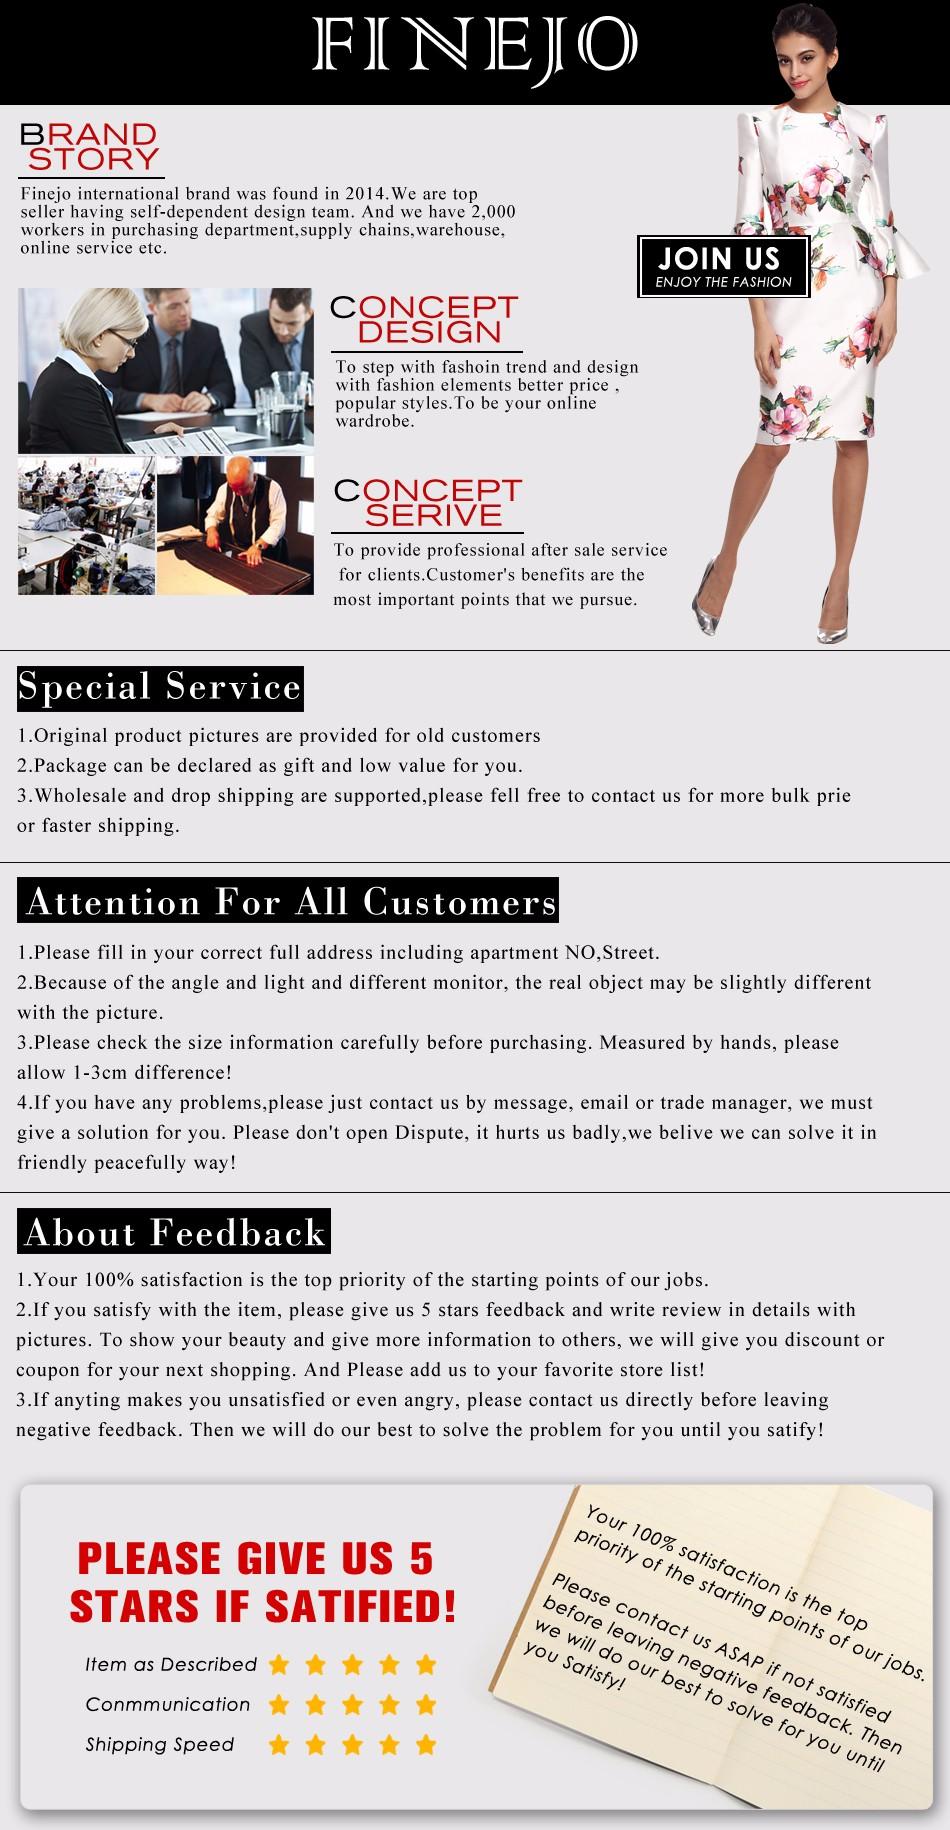 FINEJO Brand Service